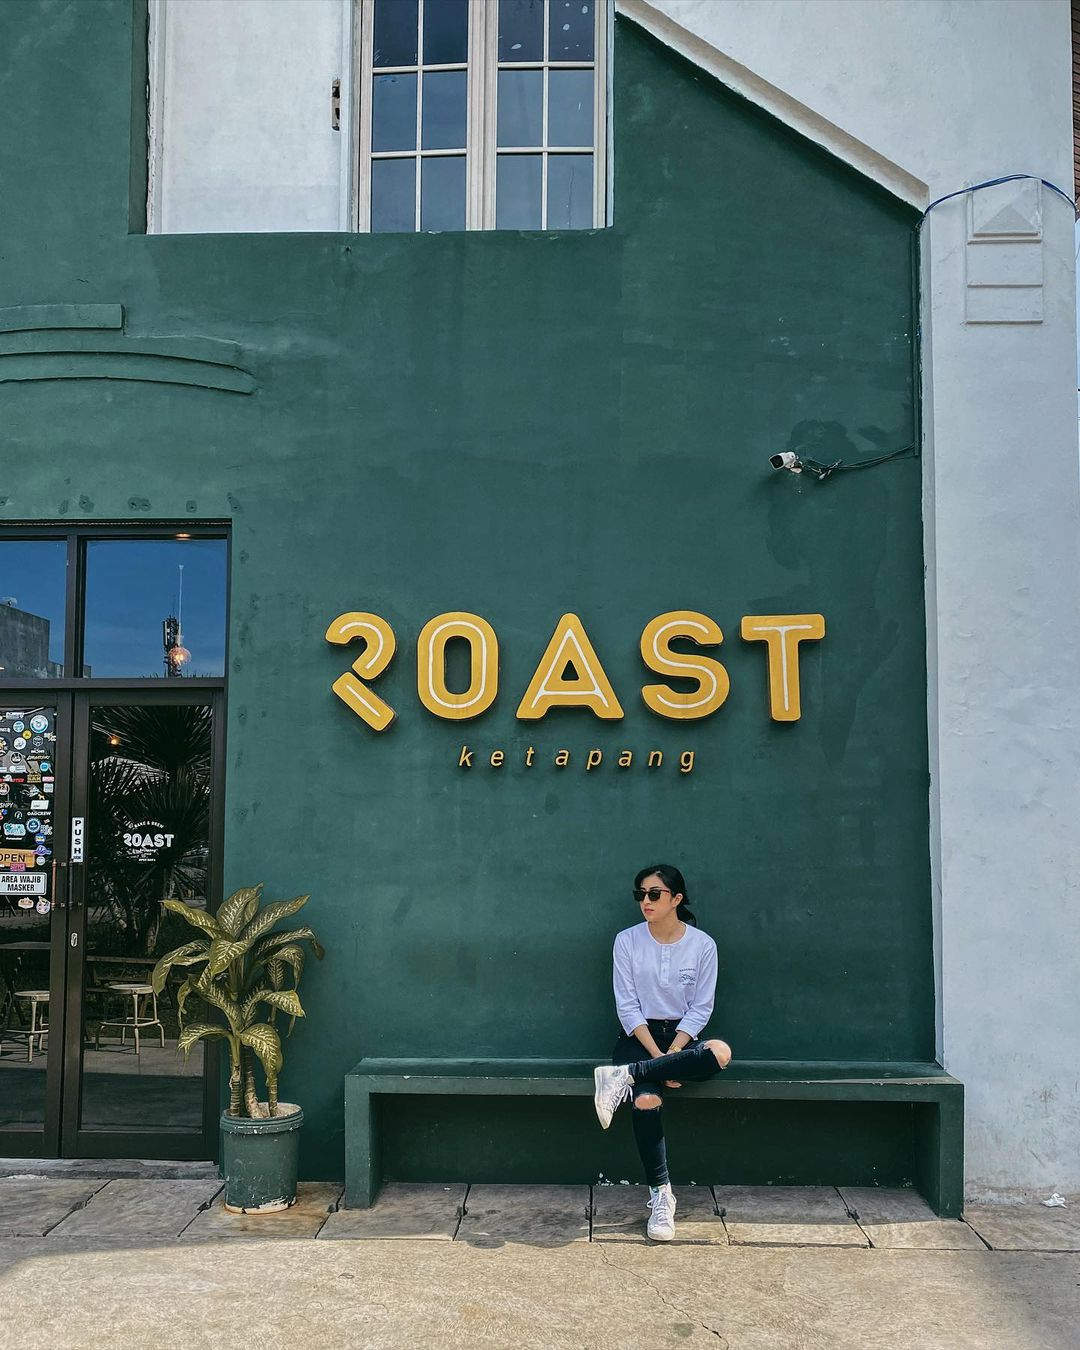 Roast Coffee Ketapang